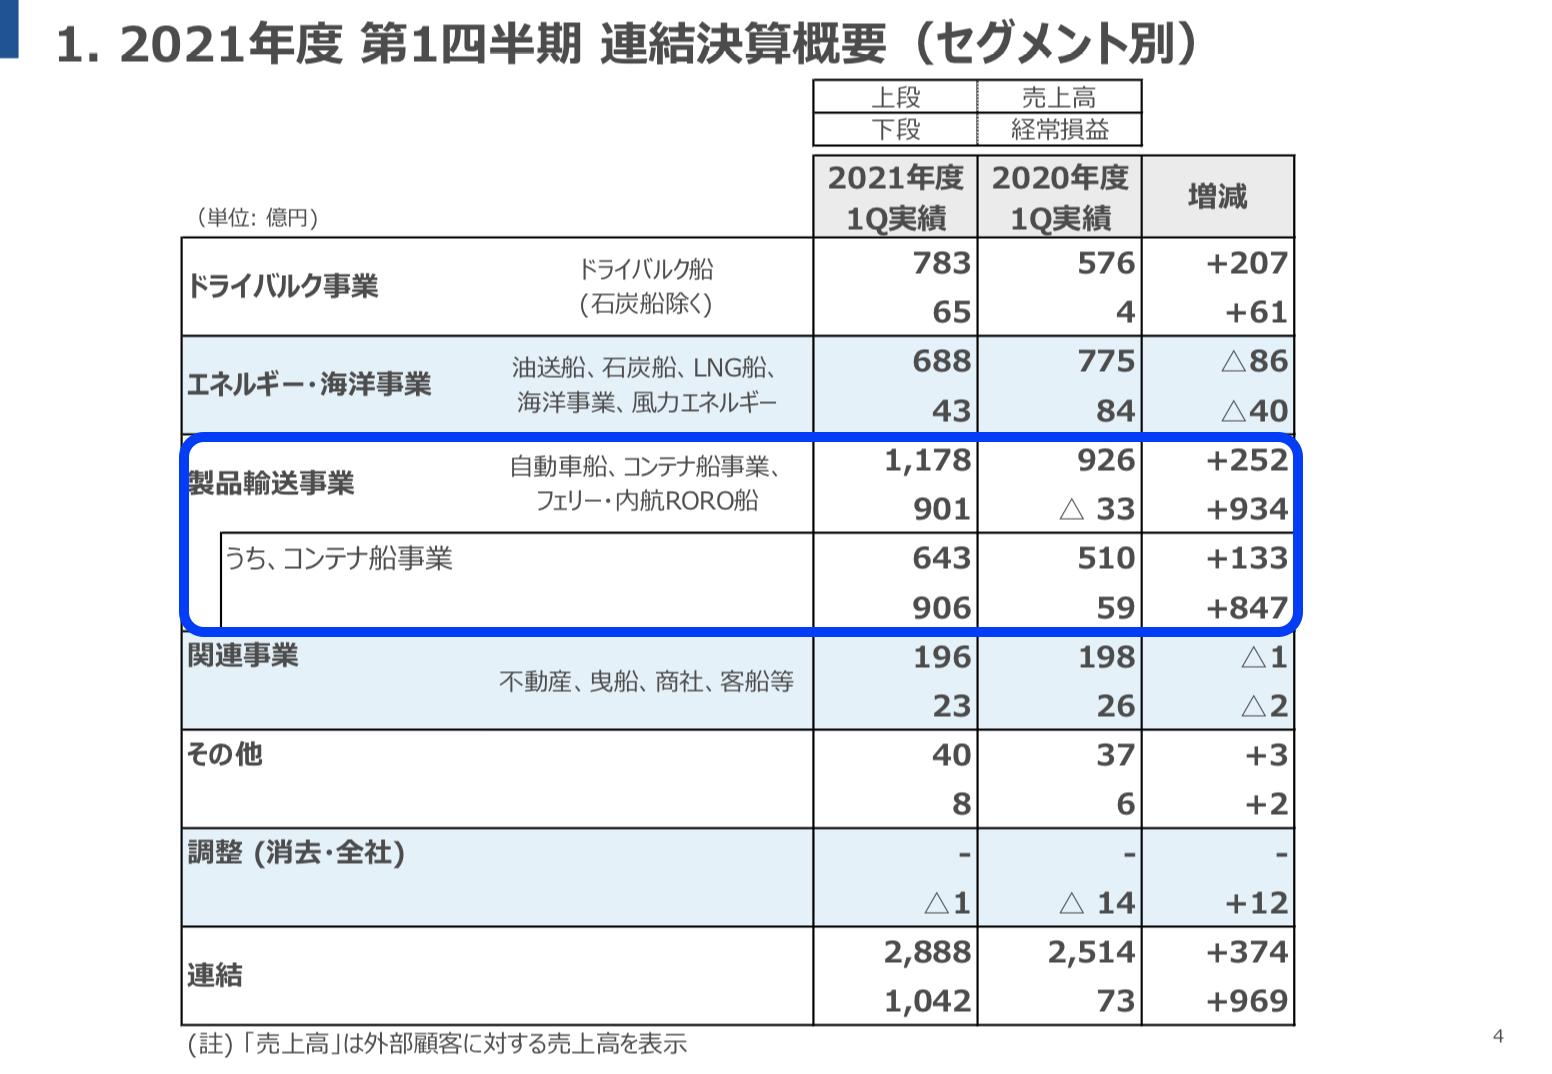 商船三井 2021年度第1四半期決算を徹底解説! さとり世代の株日記 資産運用 株 投資 資産形成